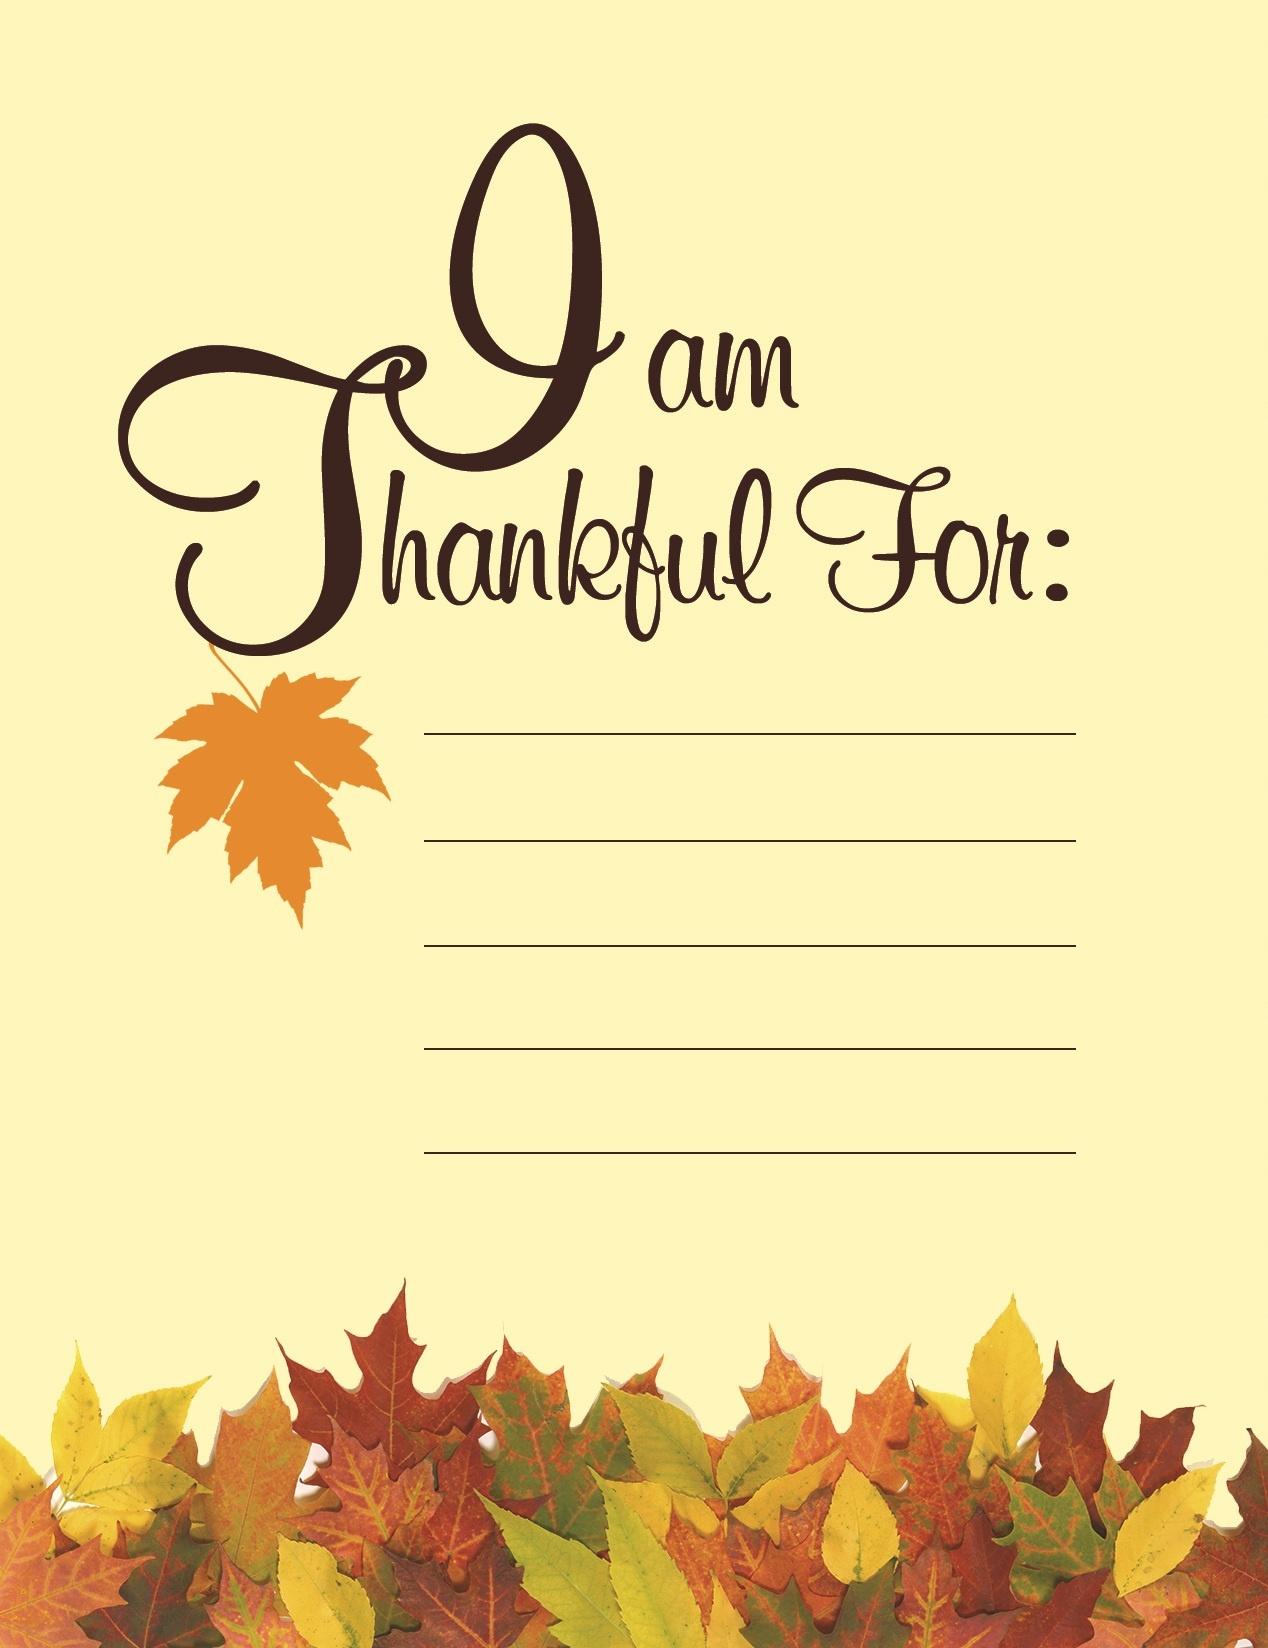 Gratitude This Thanksgiving | American Greetings Blog - Free Printable Thanksgiving Cards